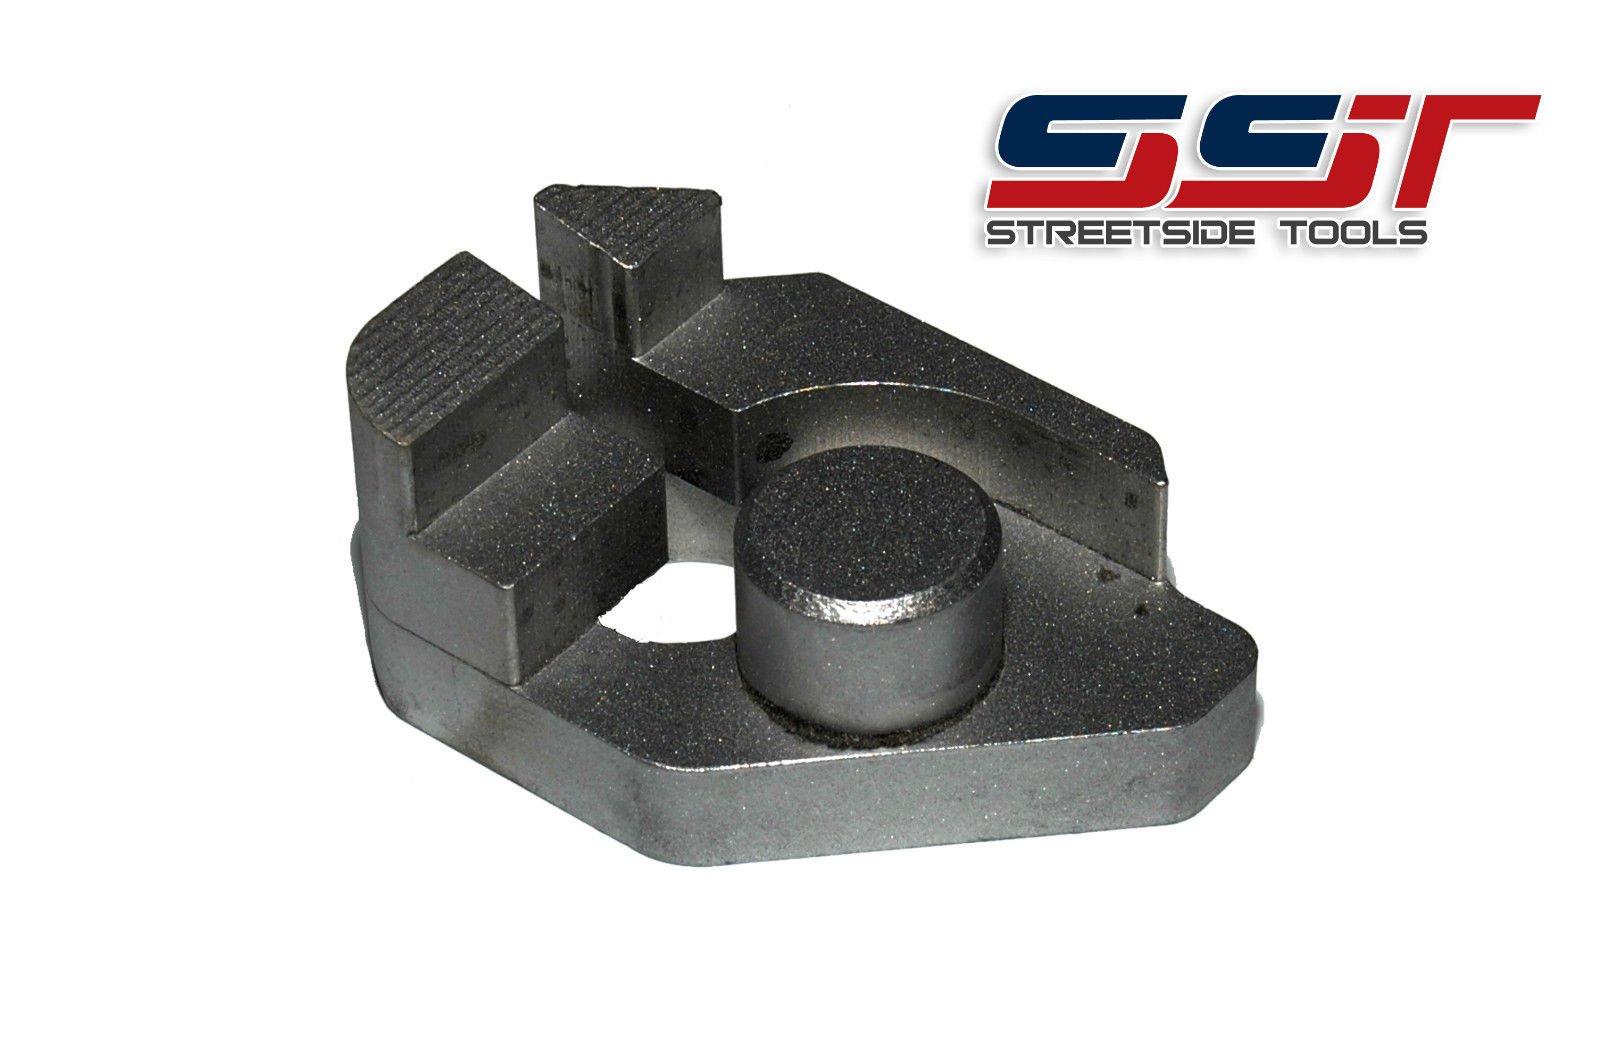 Streetside Tools SST-2901 - GM - Transmission Holding Fixture Adapter Tool [4L80-E]